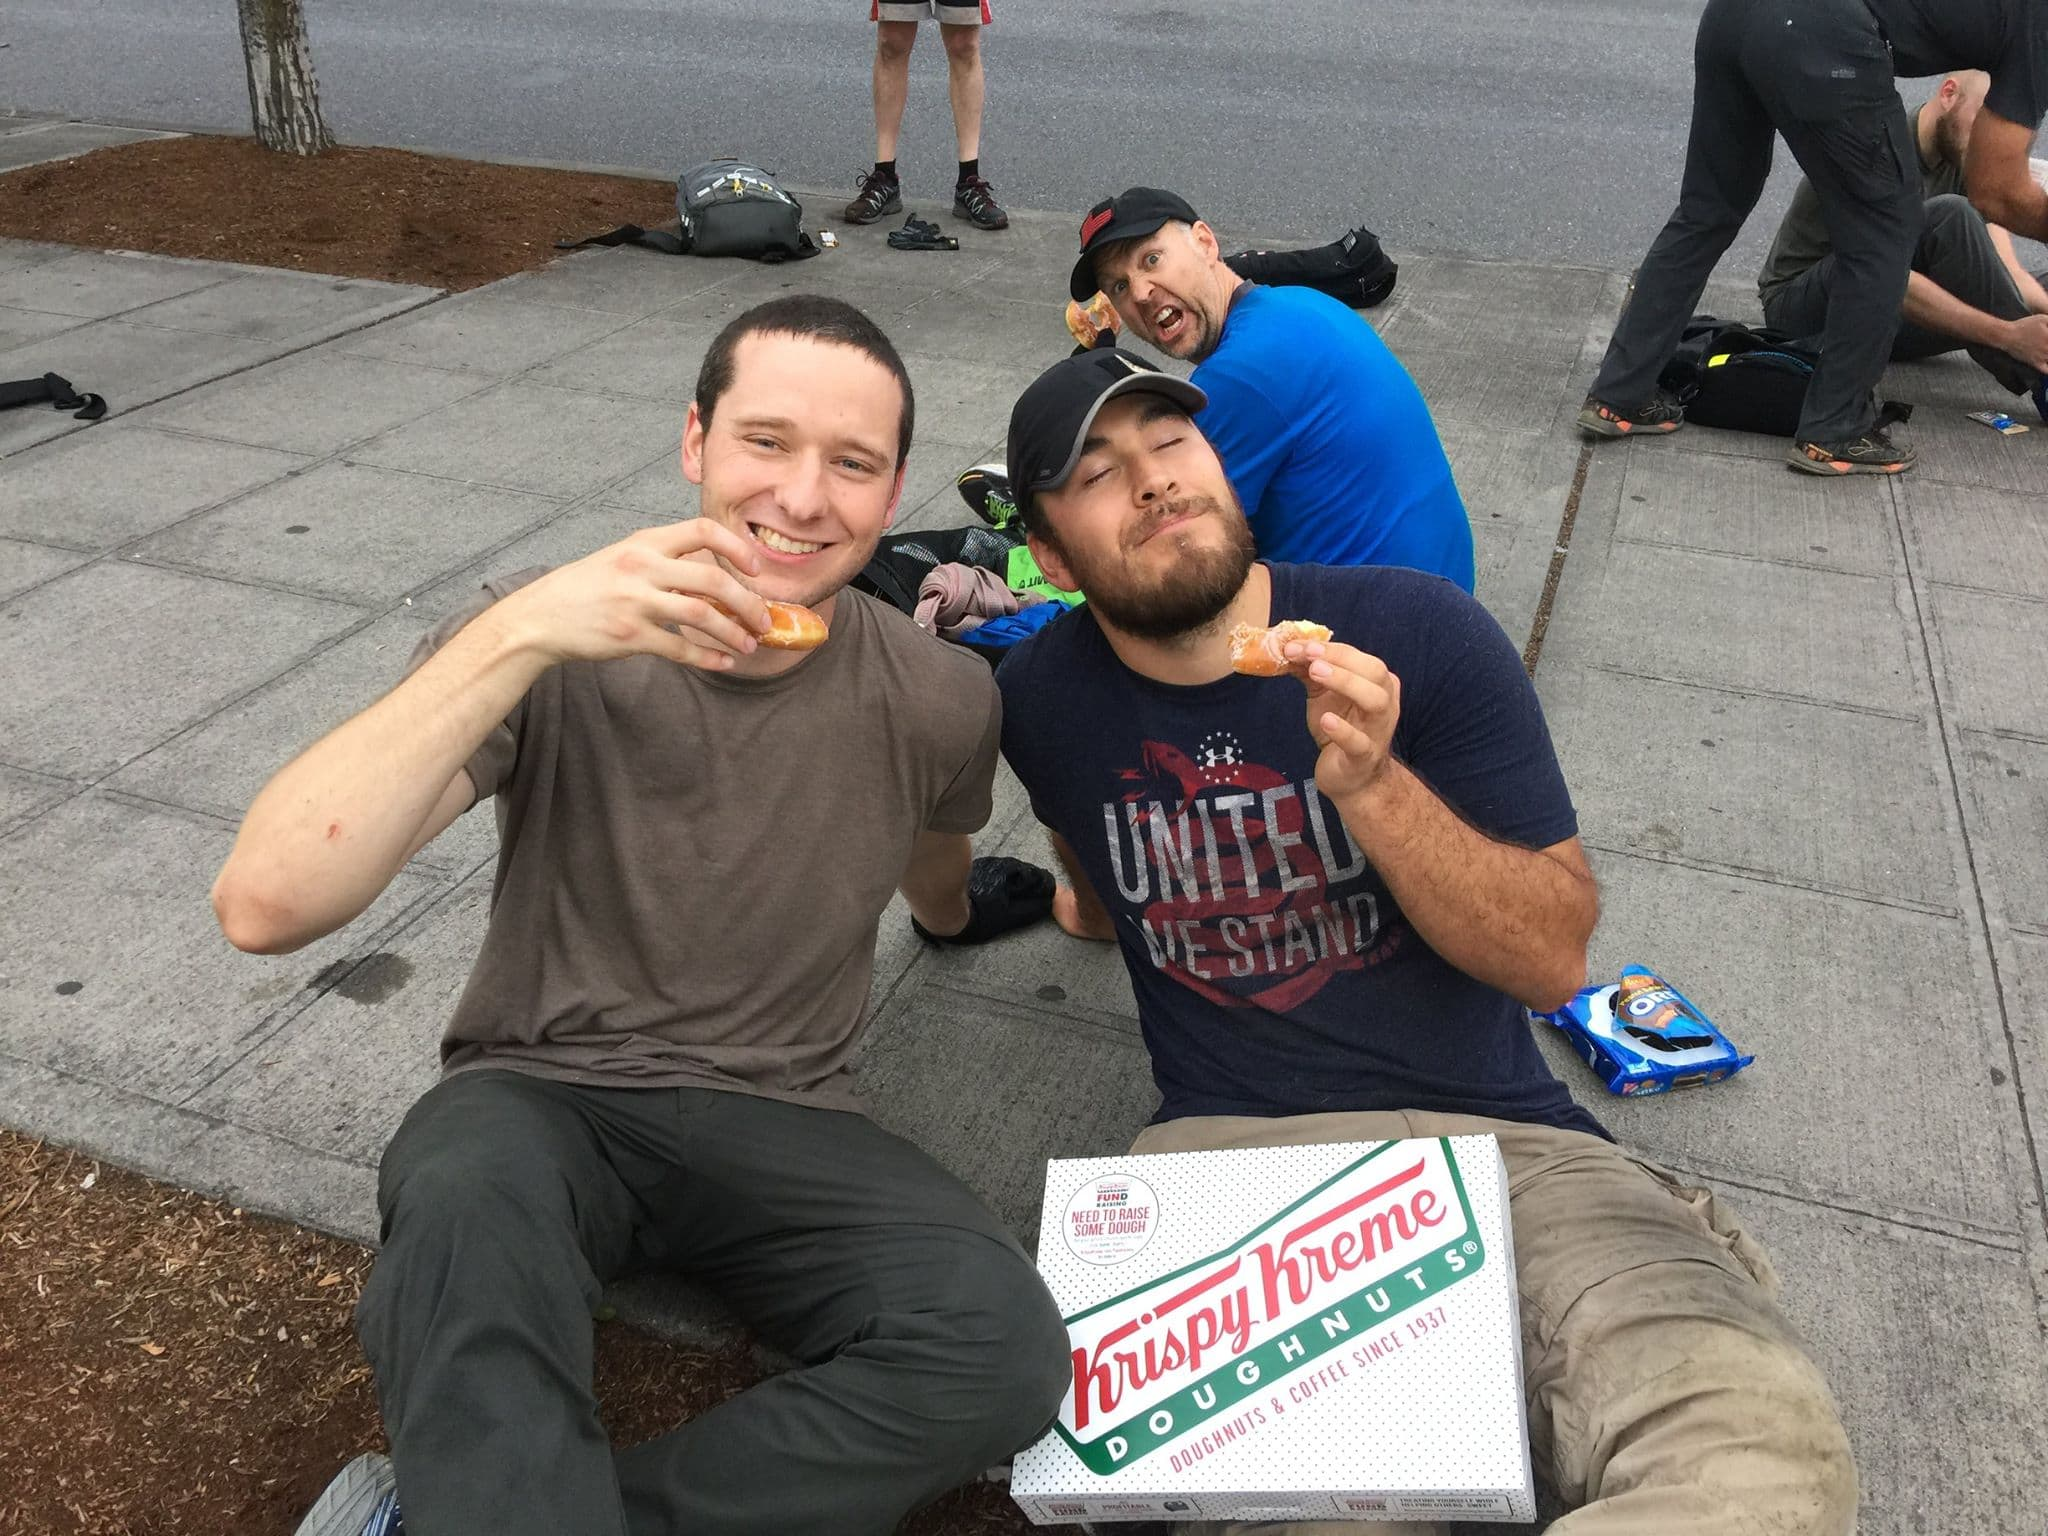 GORUCK Tough 1999 - Donut Eating Team